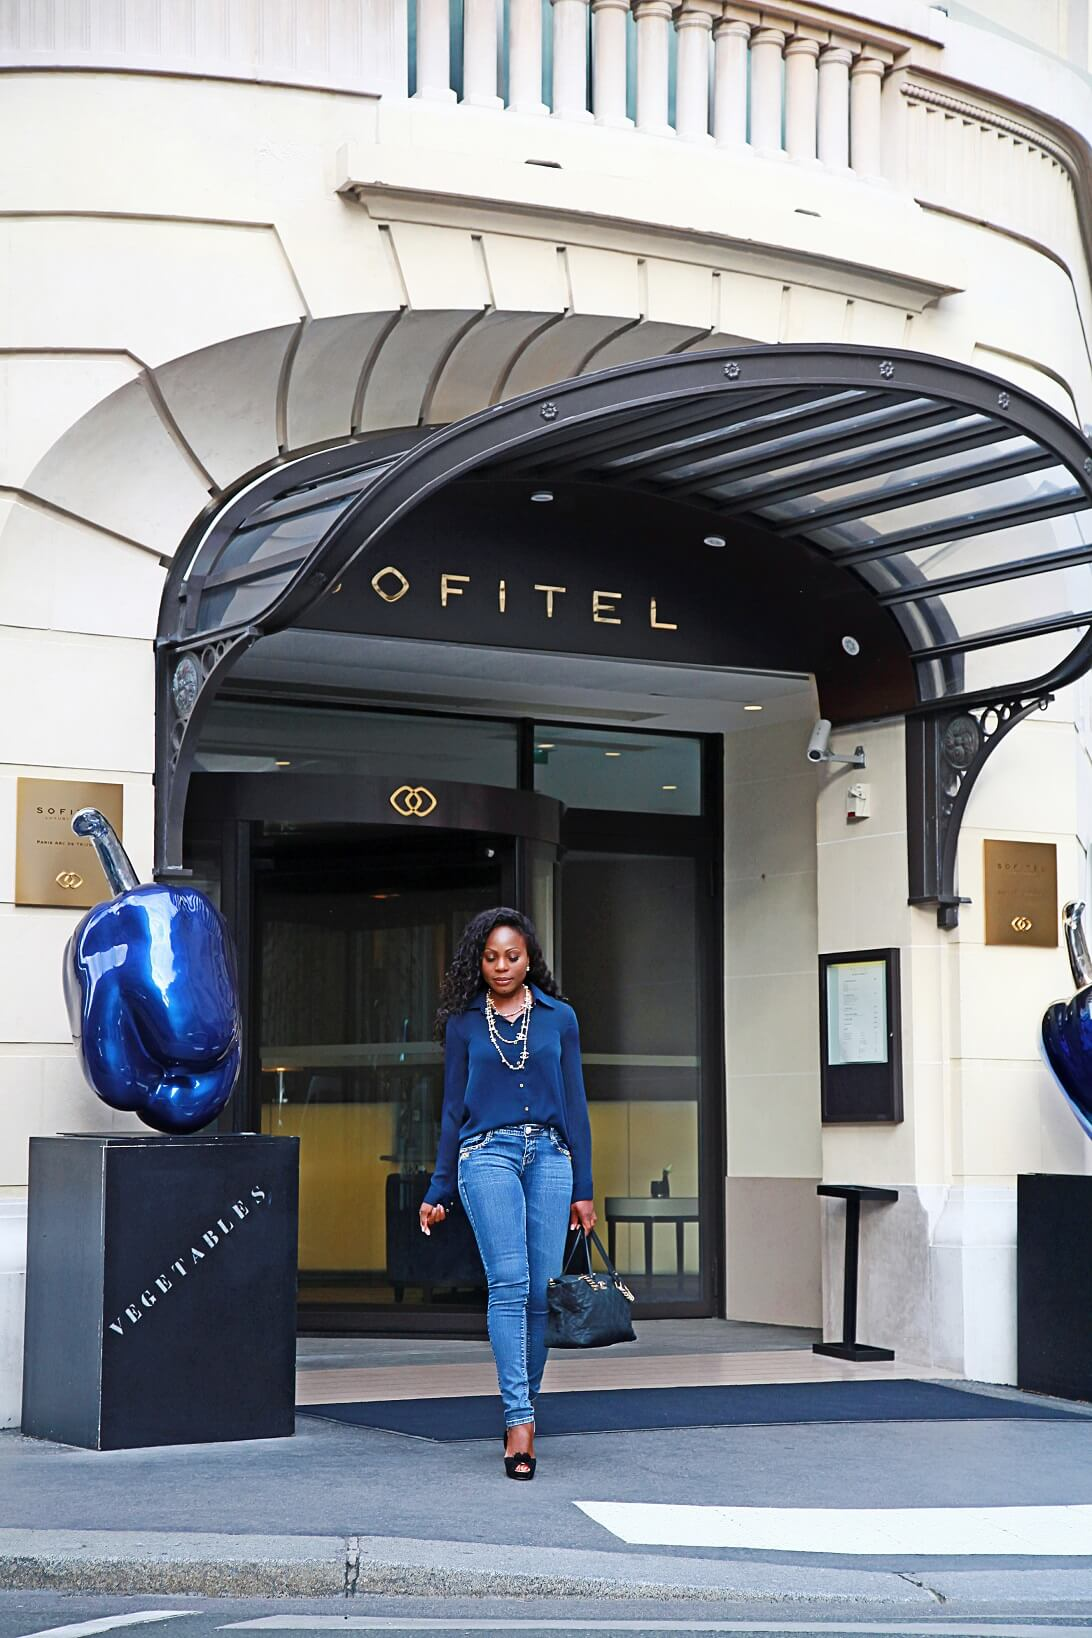 Sofitel Hotel Paris France